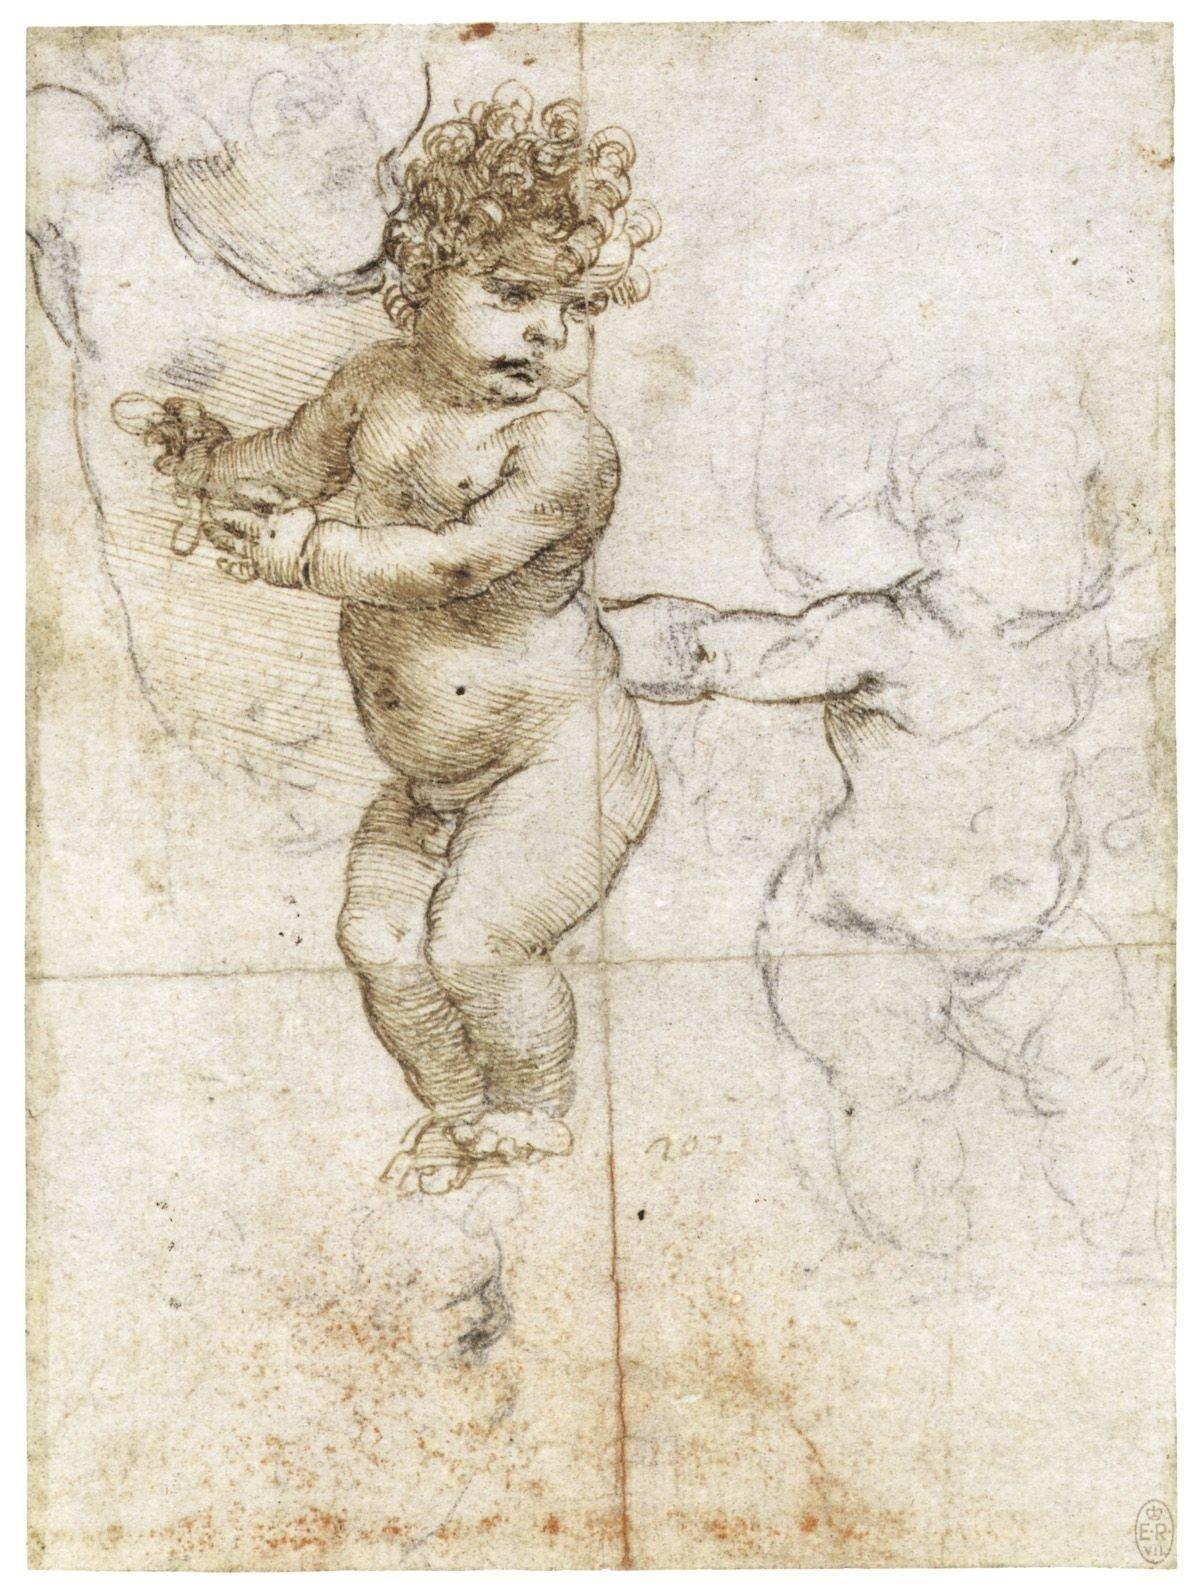 leonardo da vinci, sketch of baby | historical inspiration